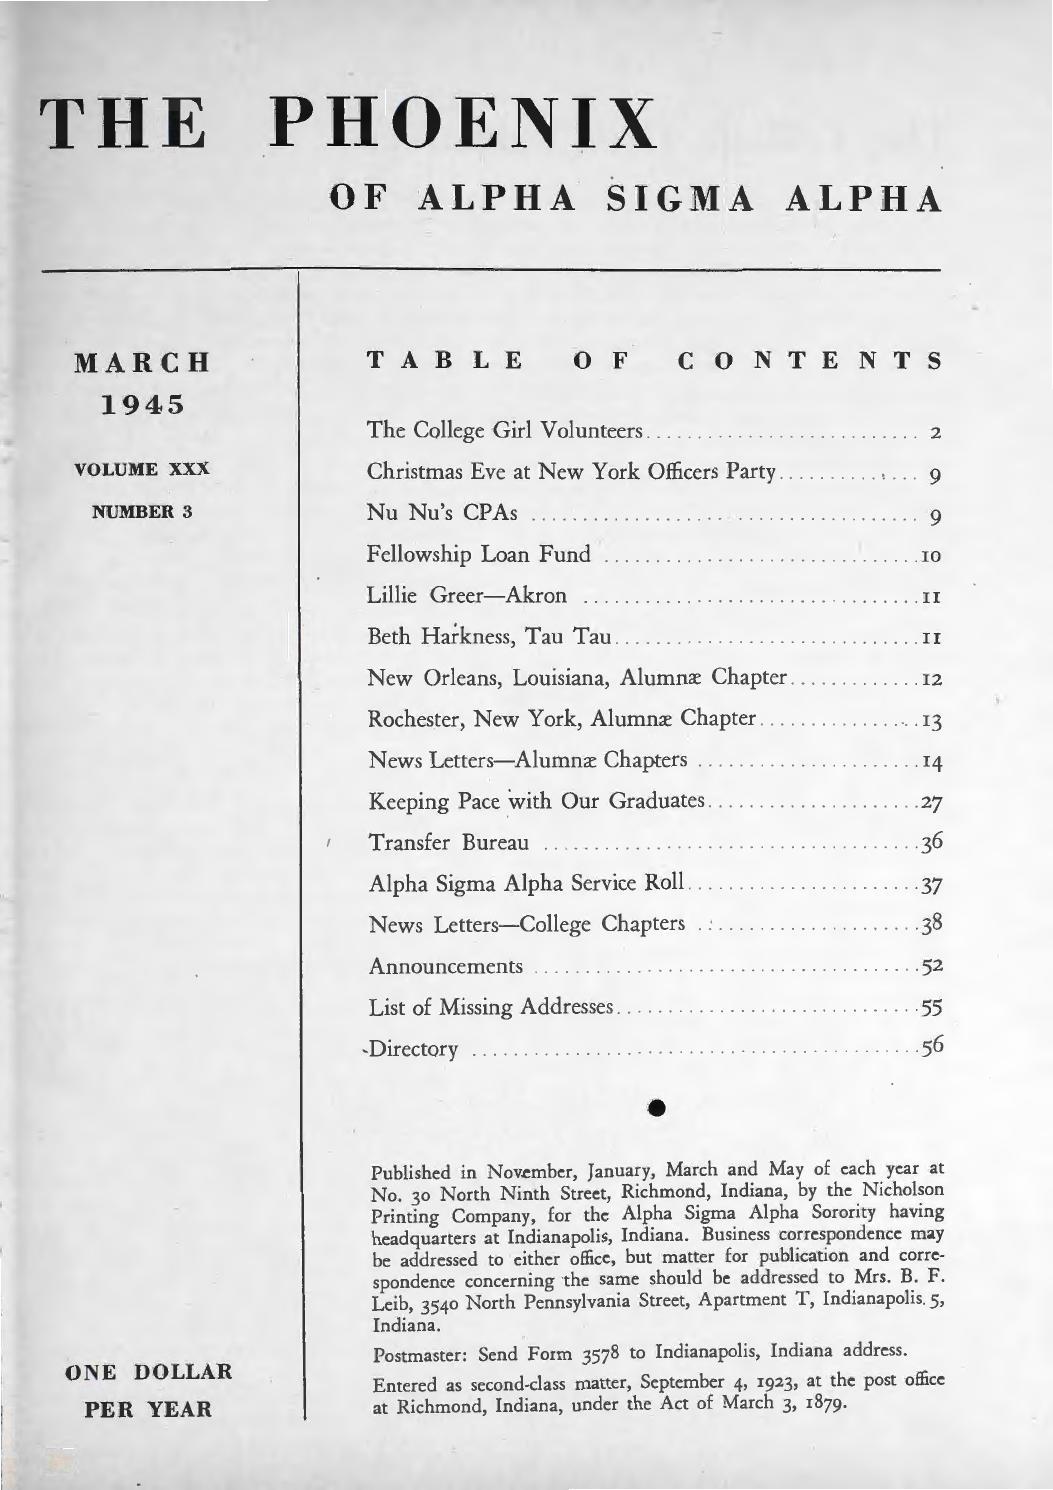 Asa Phoenix Vol 30 No 3 Mar 1945 By Alpha Sigma Sorority Issuu Wiring Up Additional Front Driving Lights Veimg2420jpg